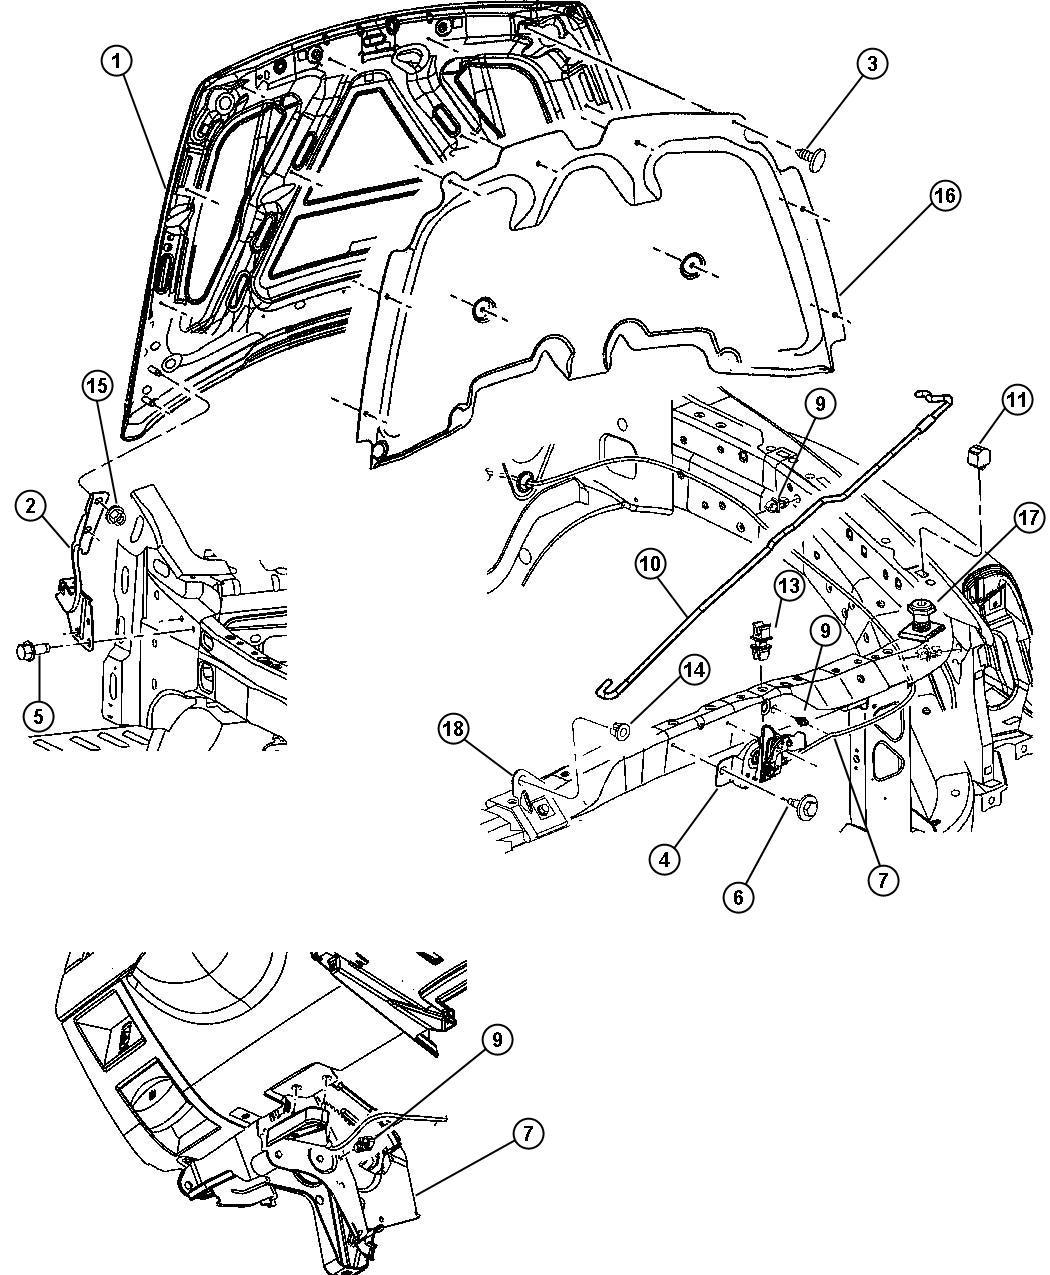 2008 Chrysler Aspen Release. Hood latch. Related, mopar